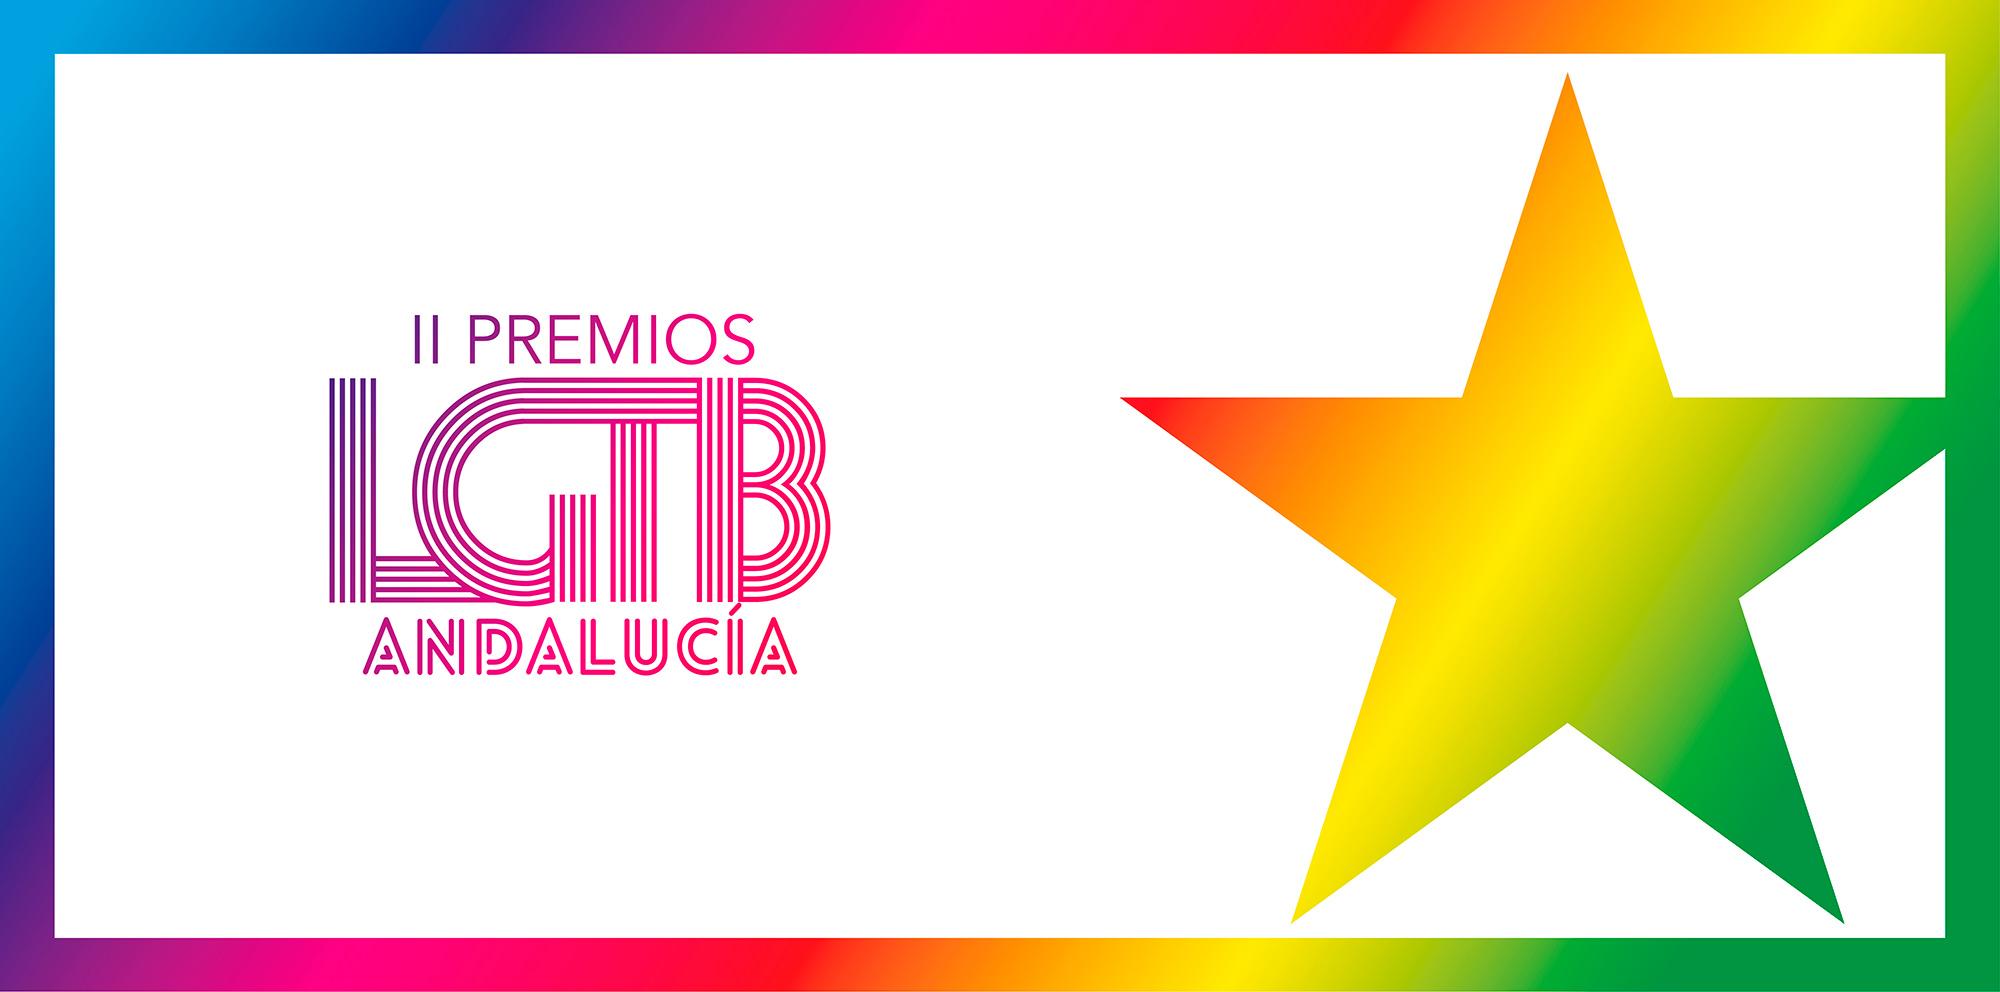 Photo of Actividades de los Premios LGTB Andalucía